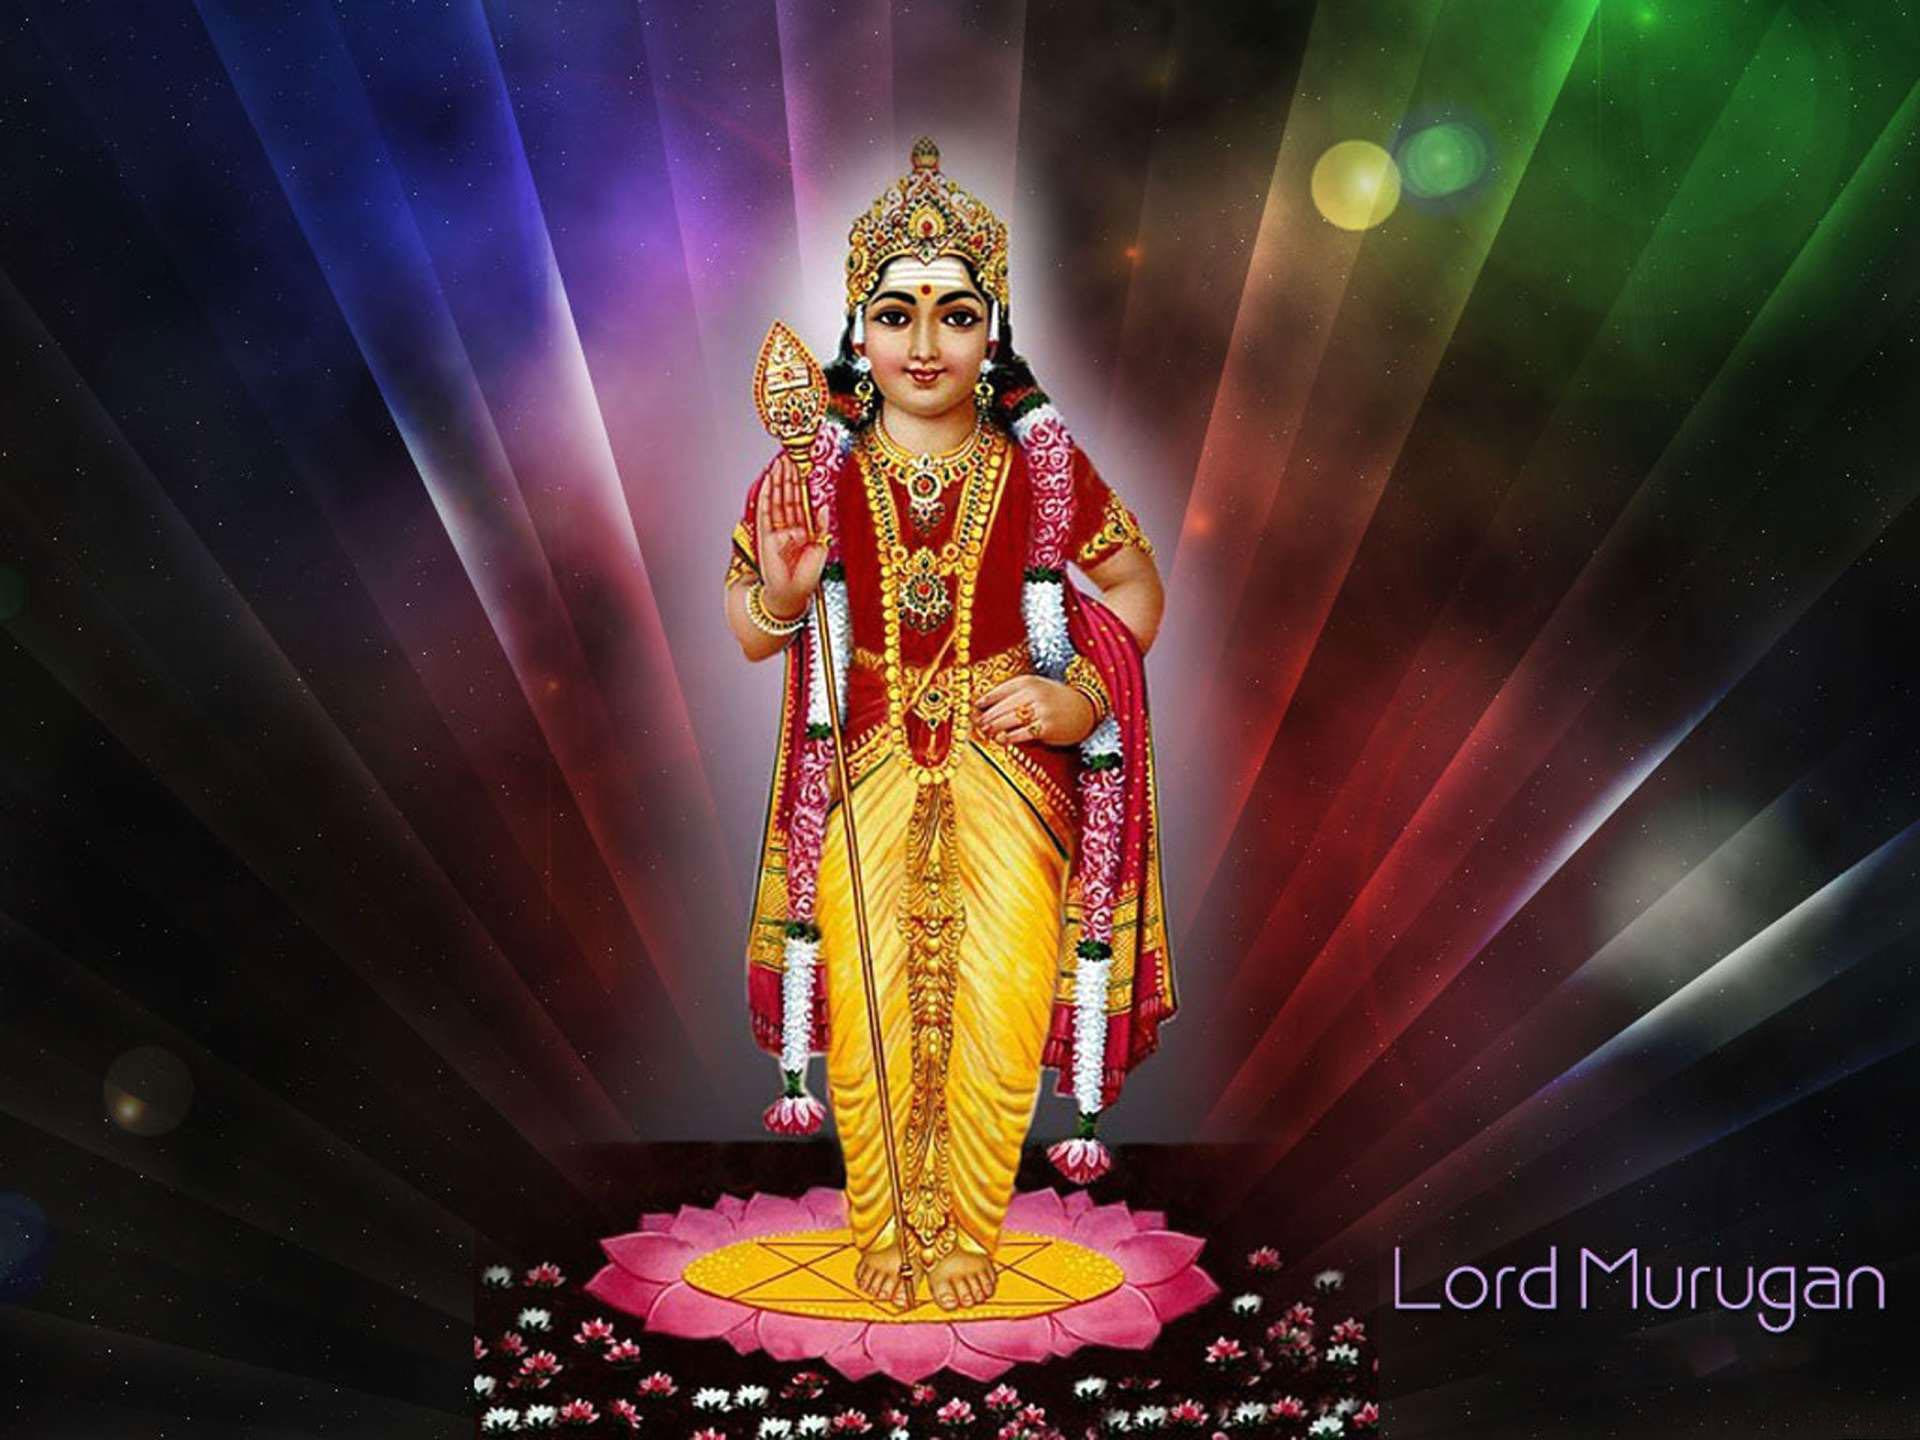 god murugan images hd